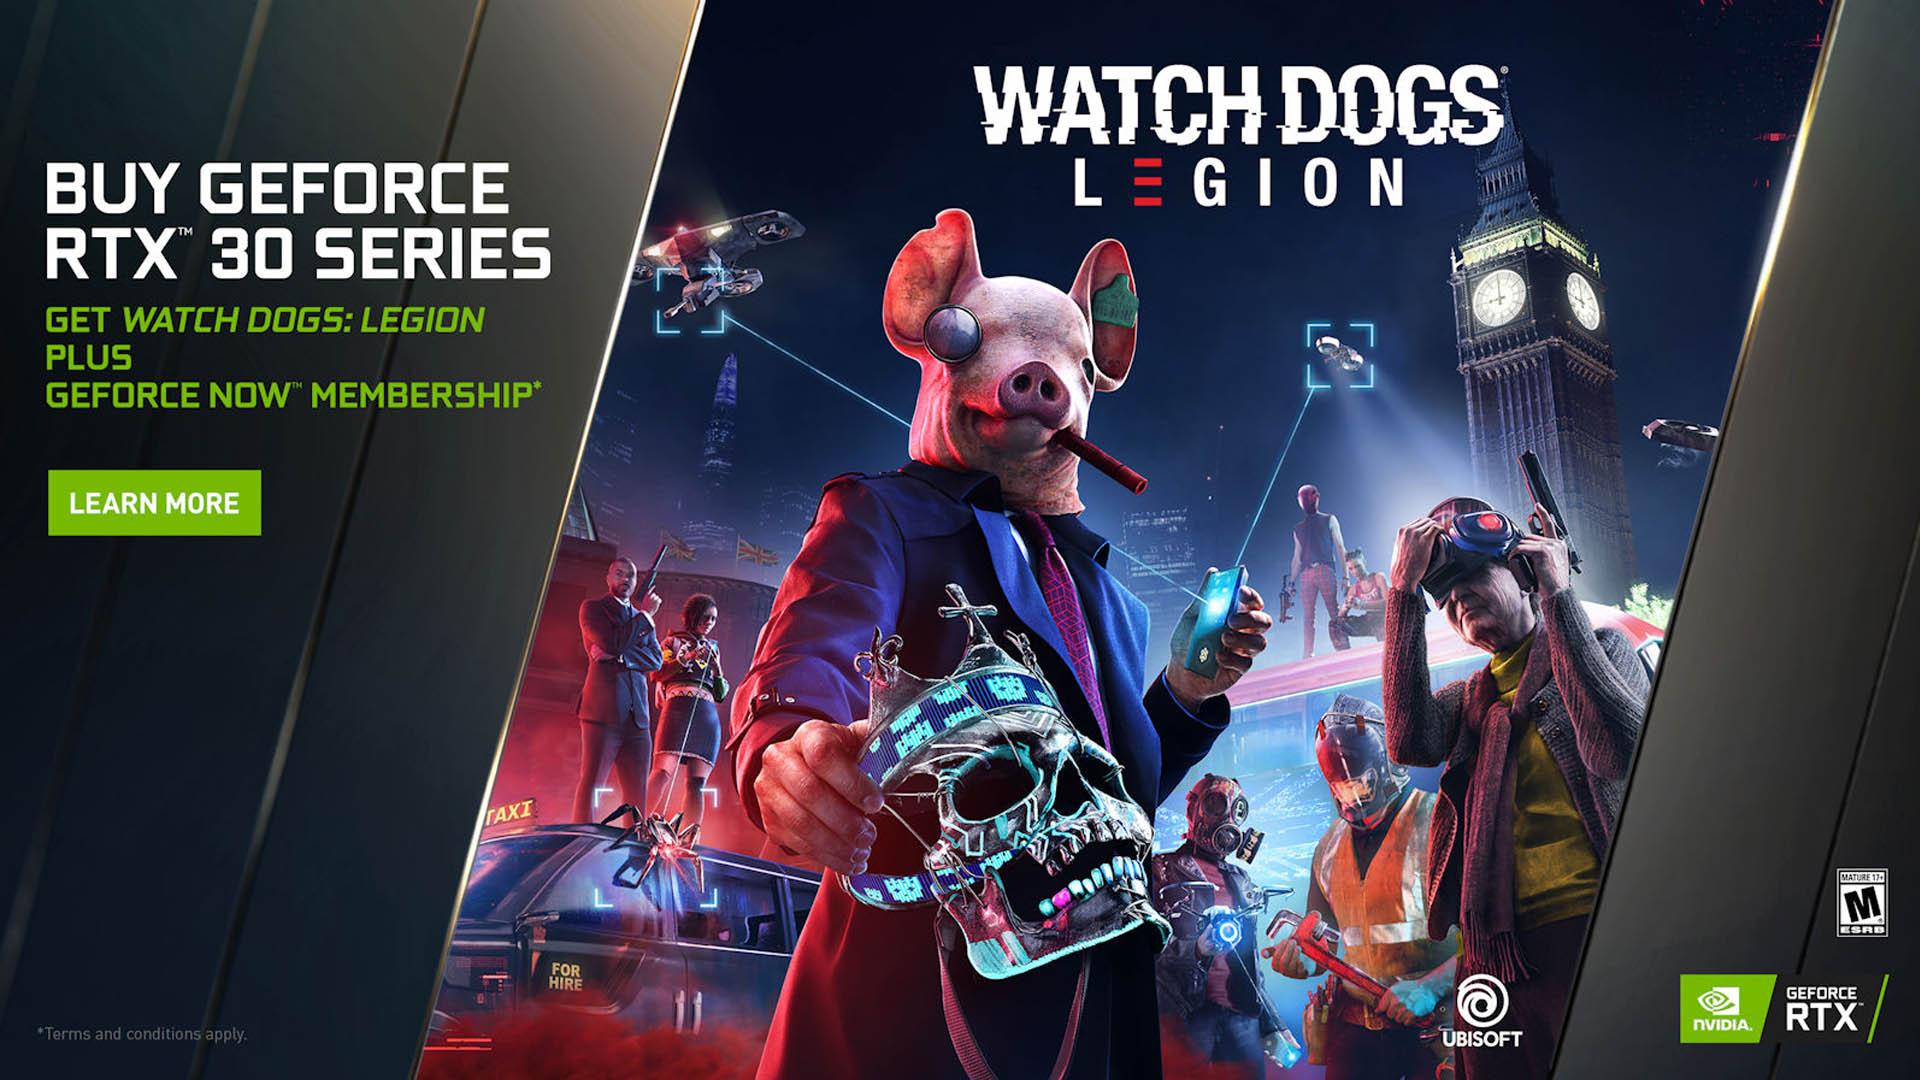 nvidia-geforce-rtx-30-series-watch-dogs-legion-bundle 1